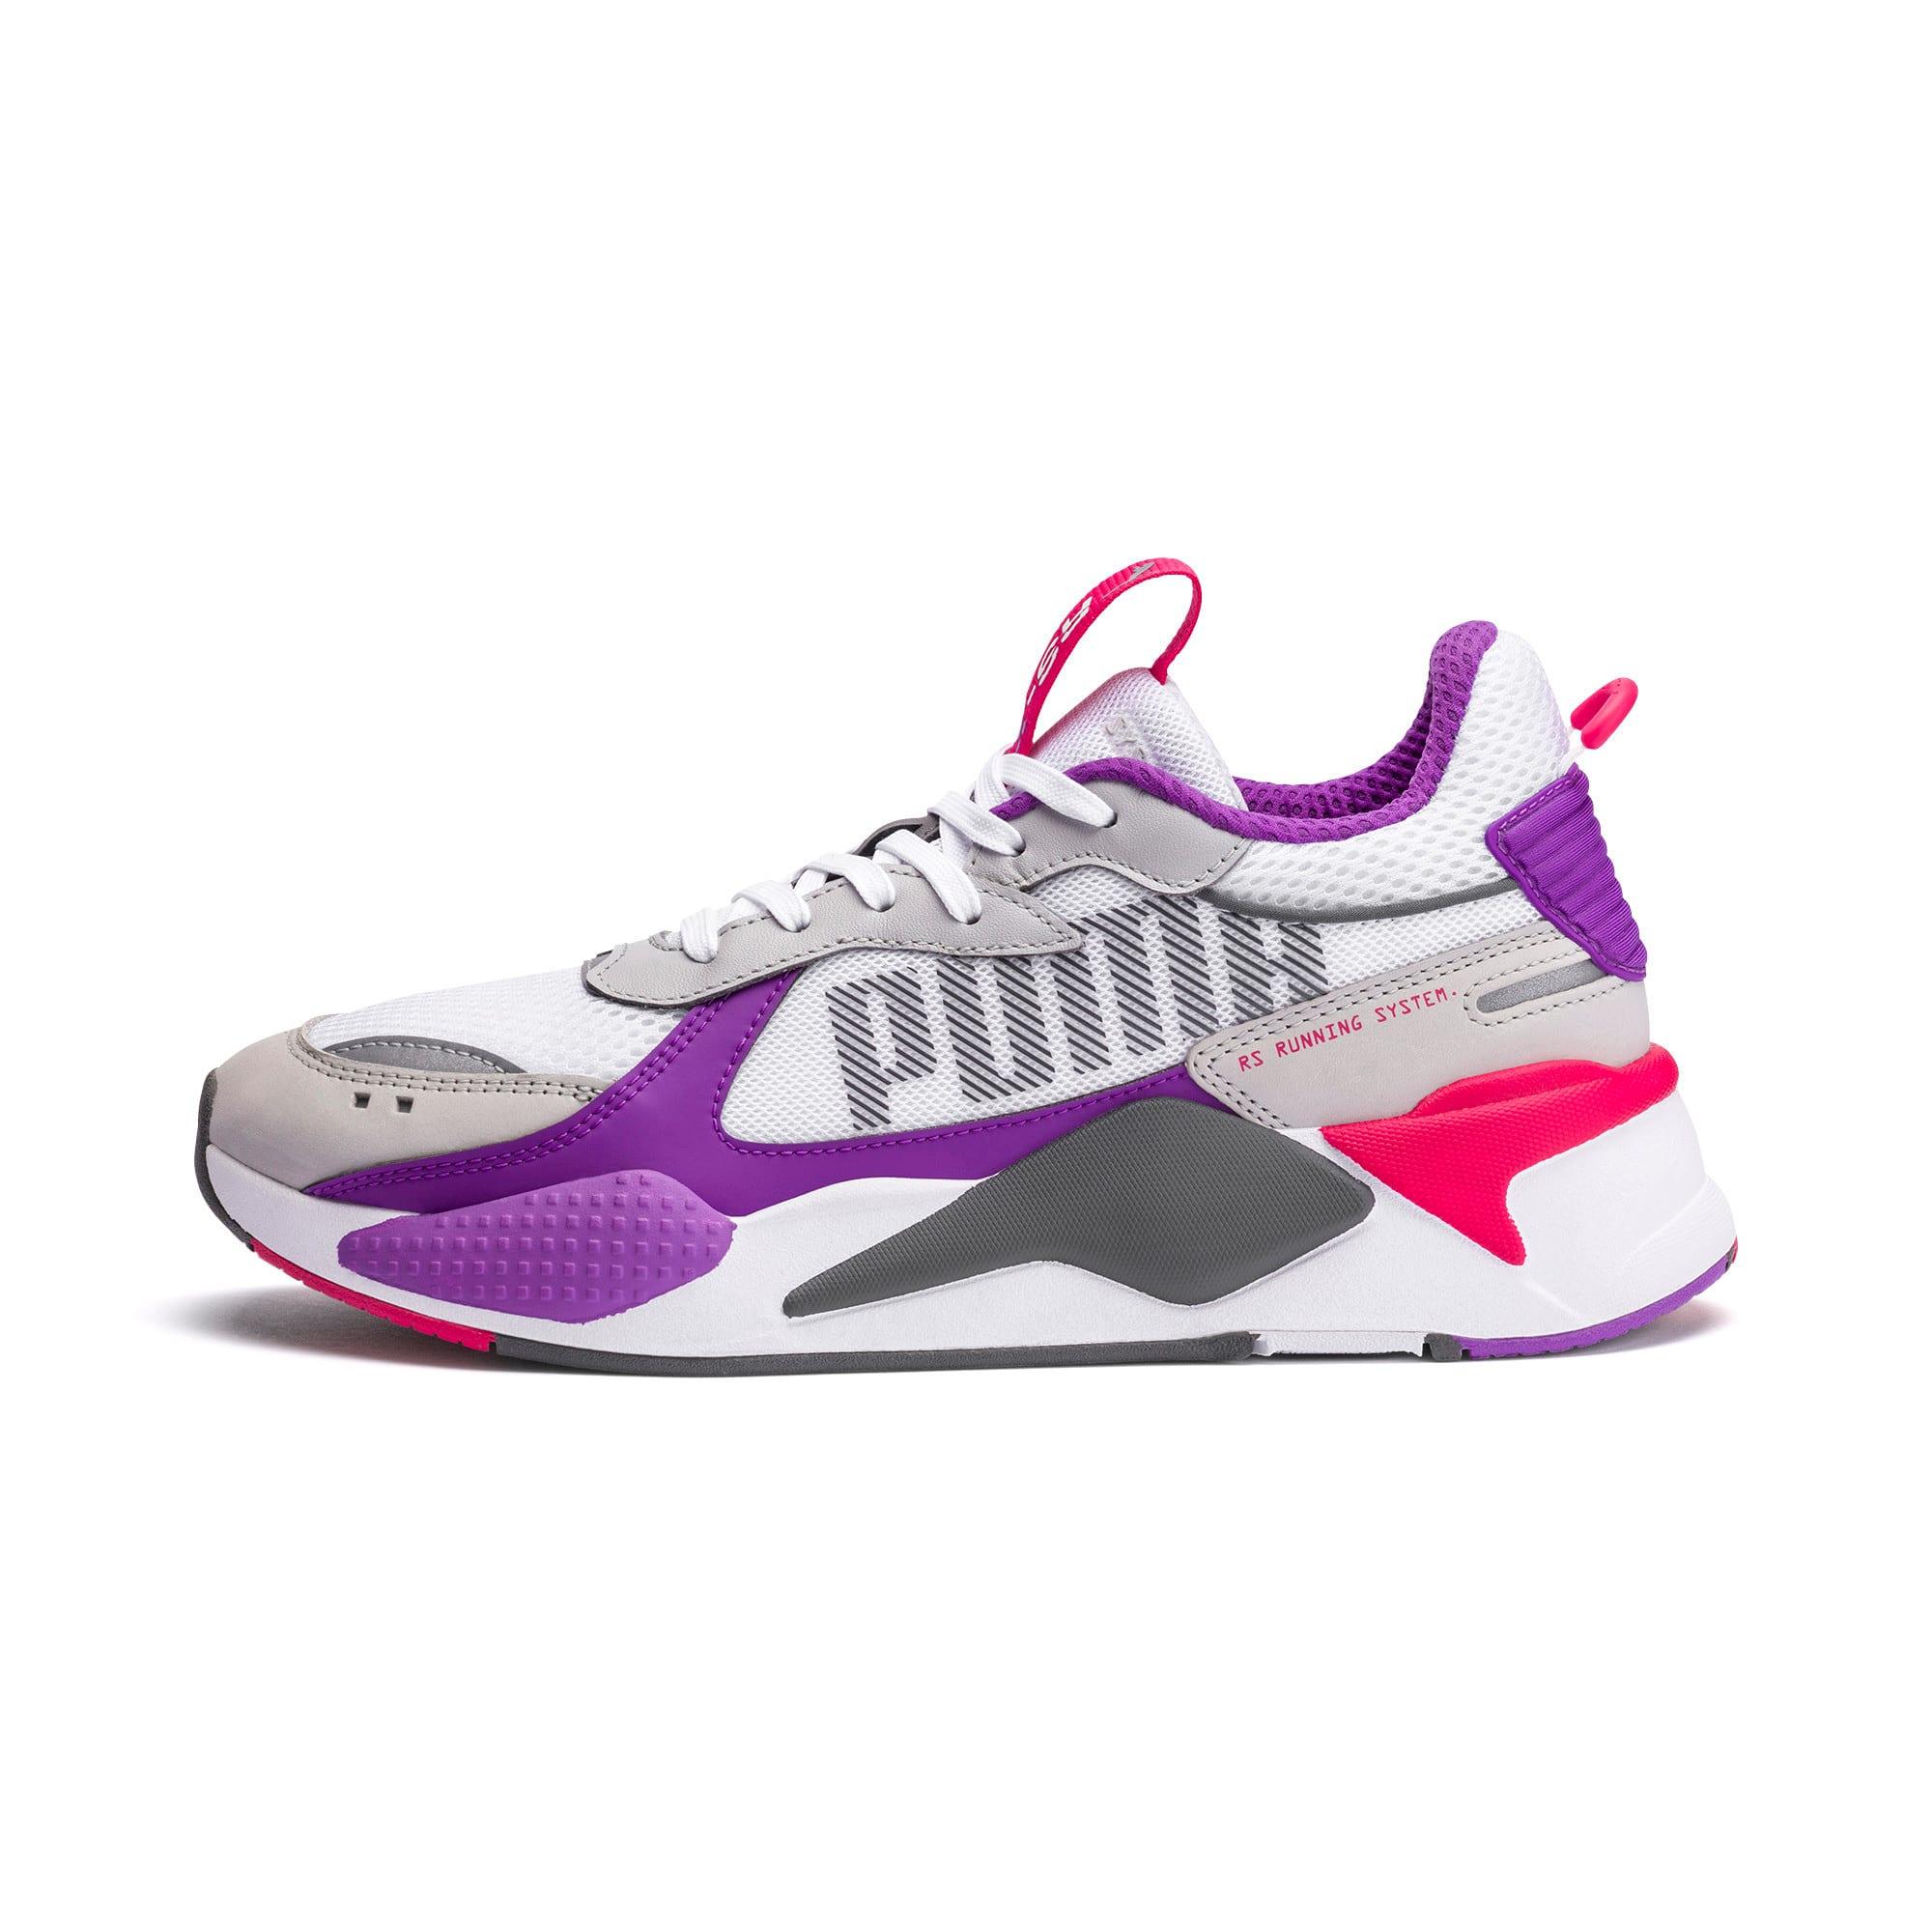 Thumbnail 1 of RS-X Bold Sneaker, PWhite-High Rise-Royal Lilac, medium